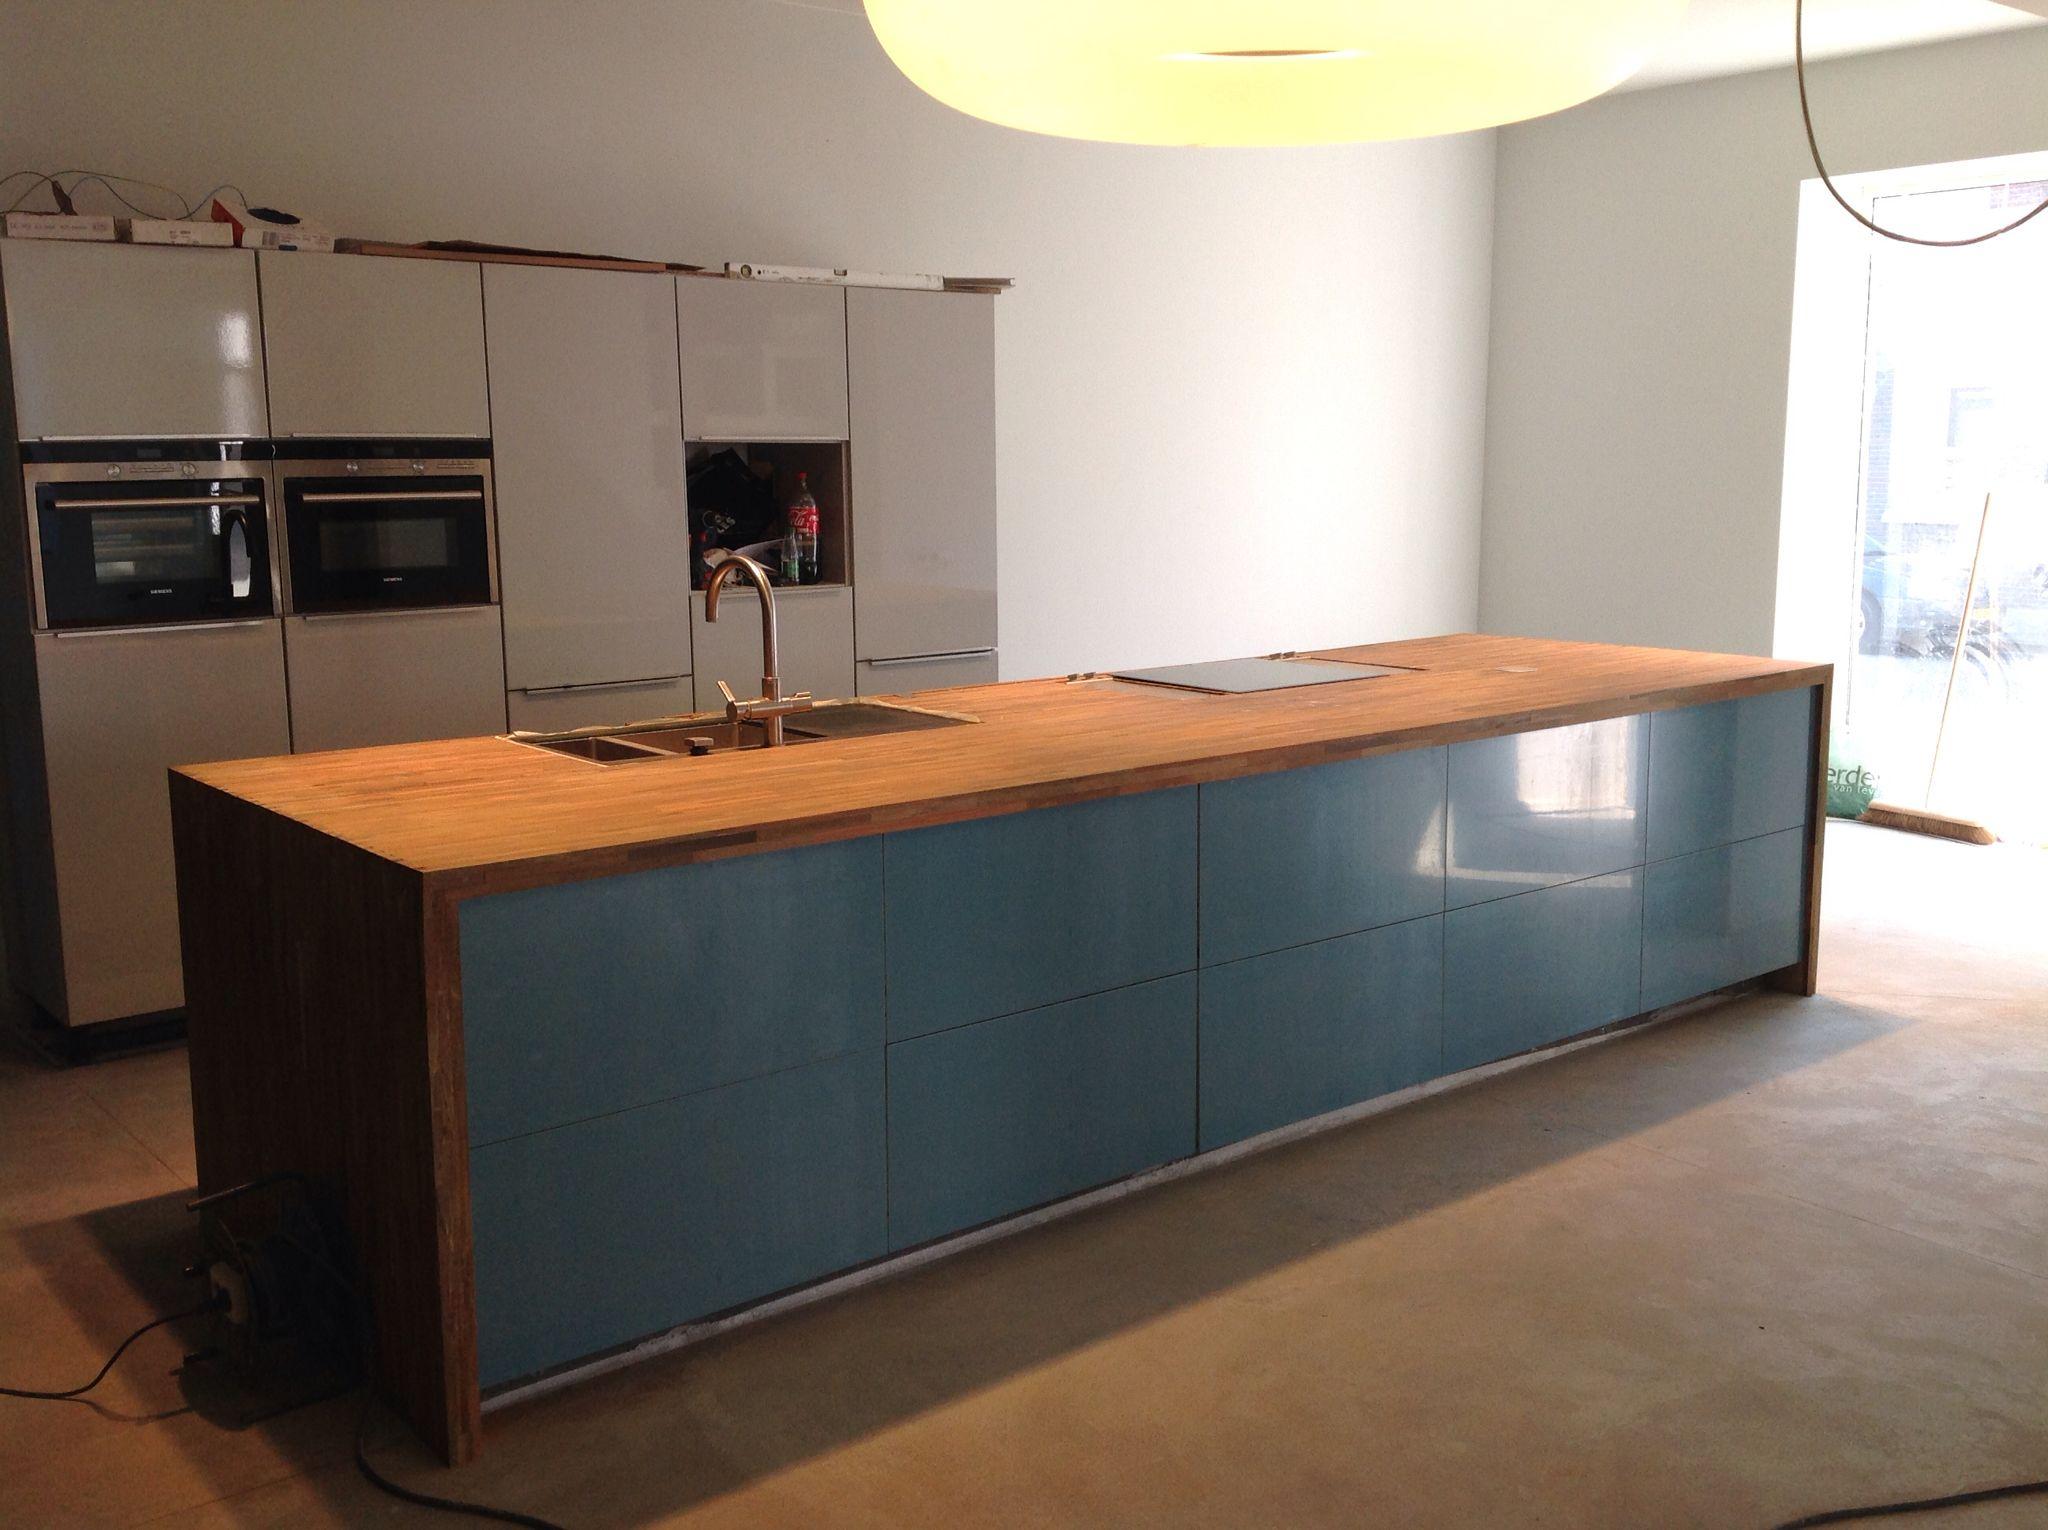 Wfk Küchen ~ Ikea has a new door style kallarp. high gloss gray turquoise